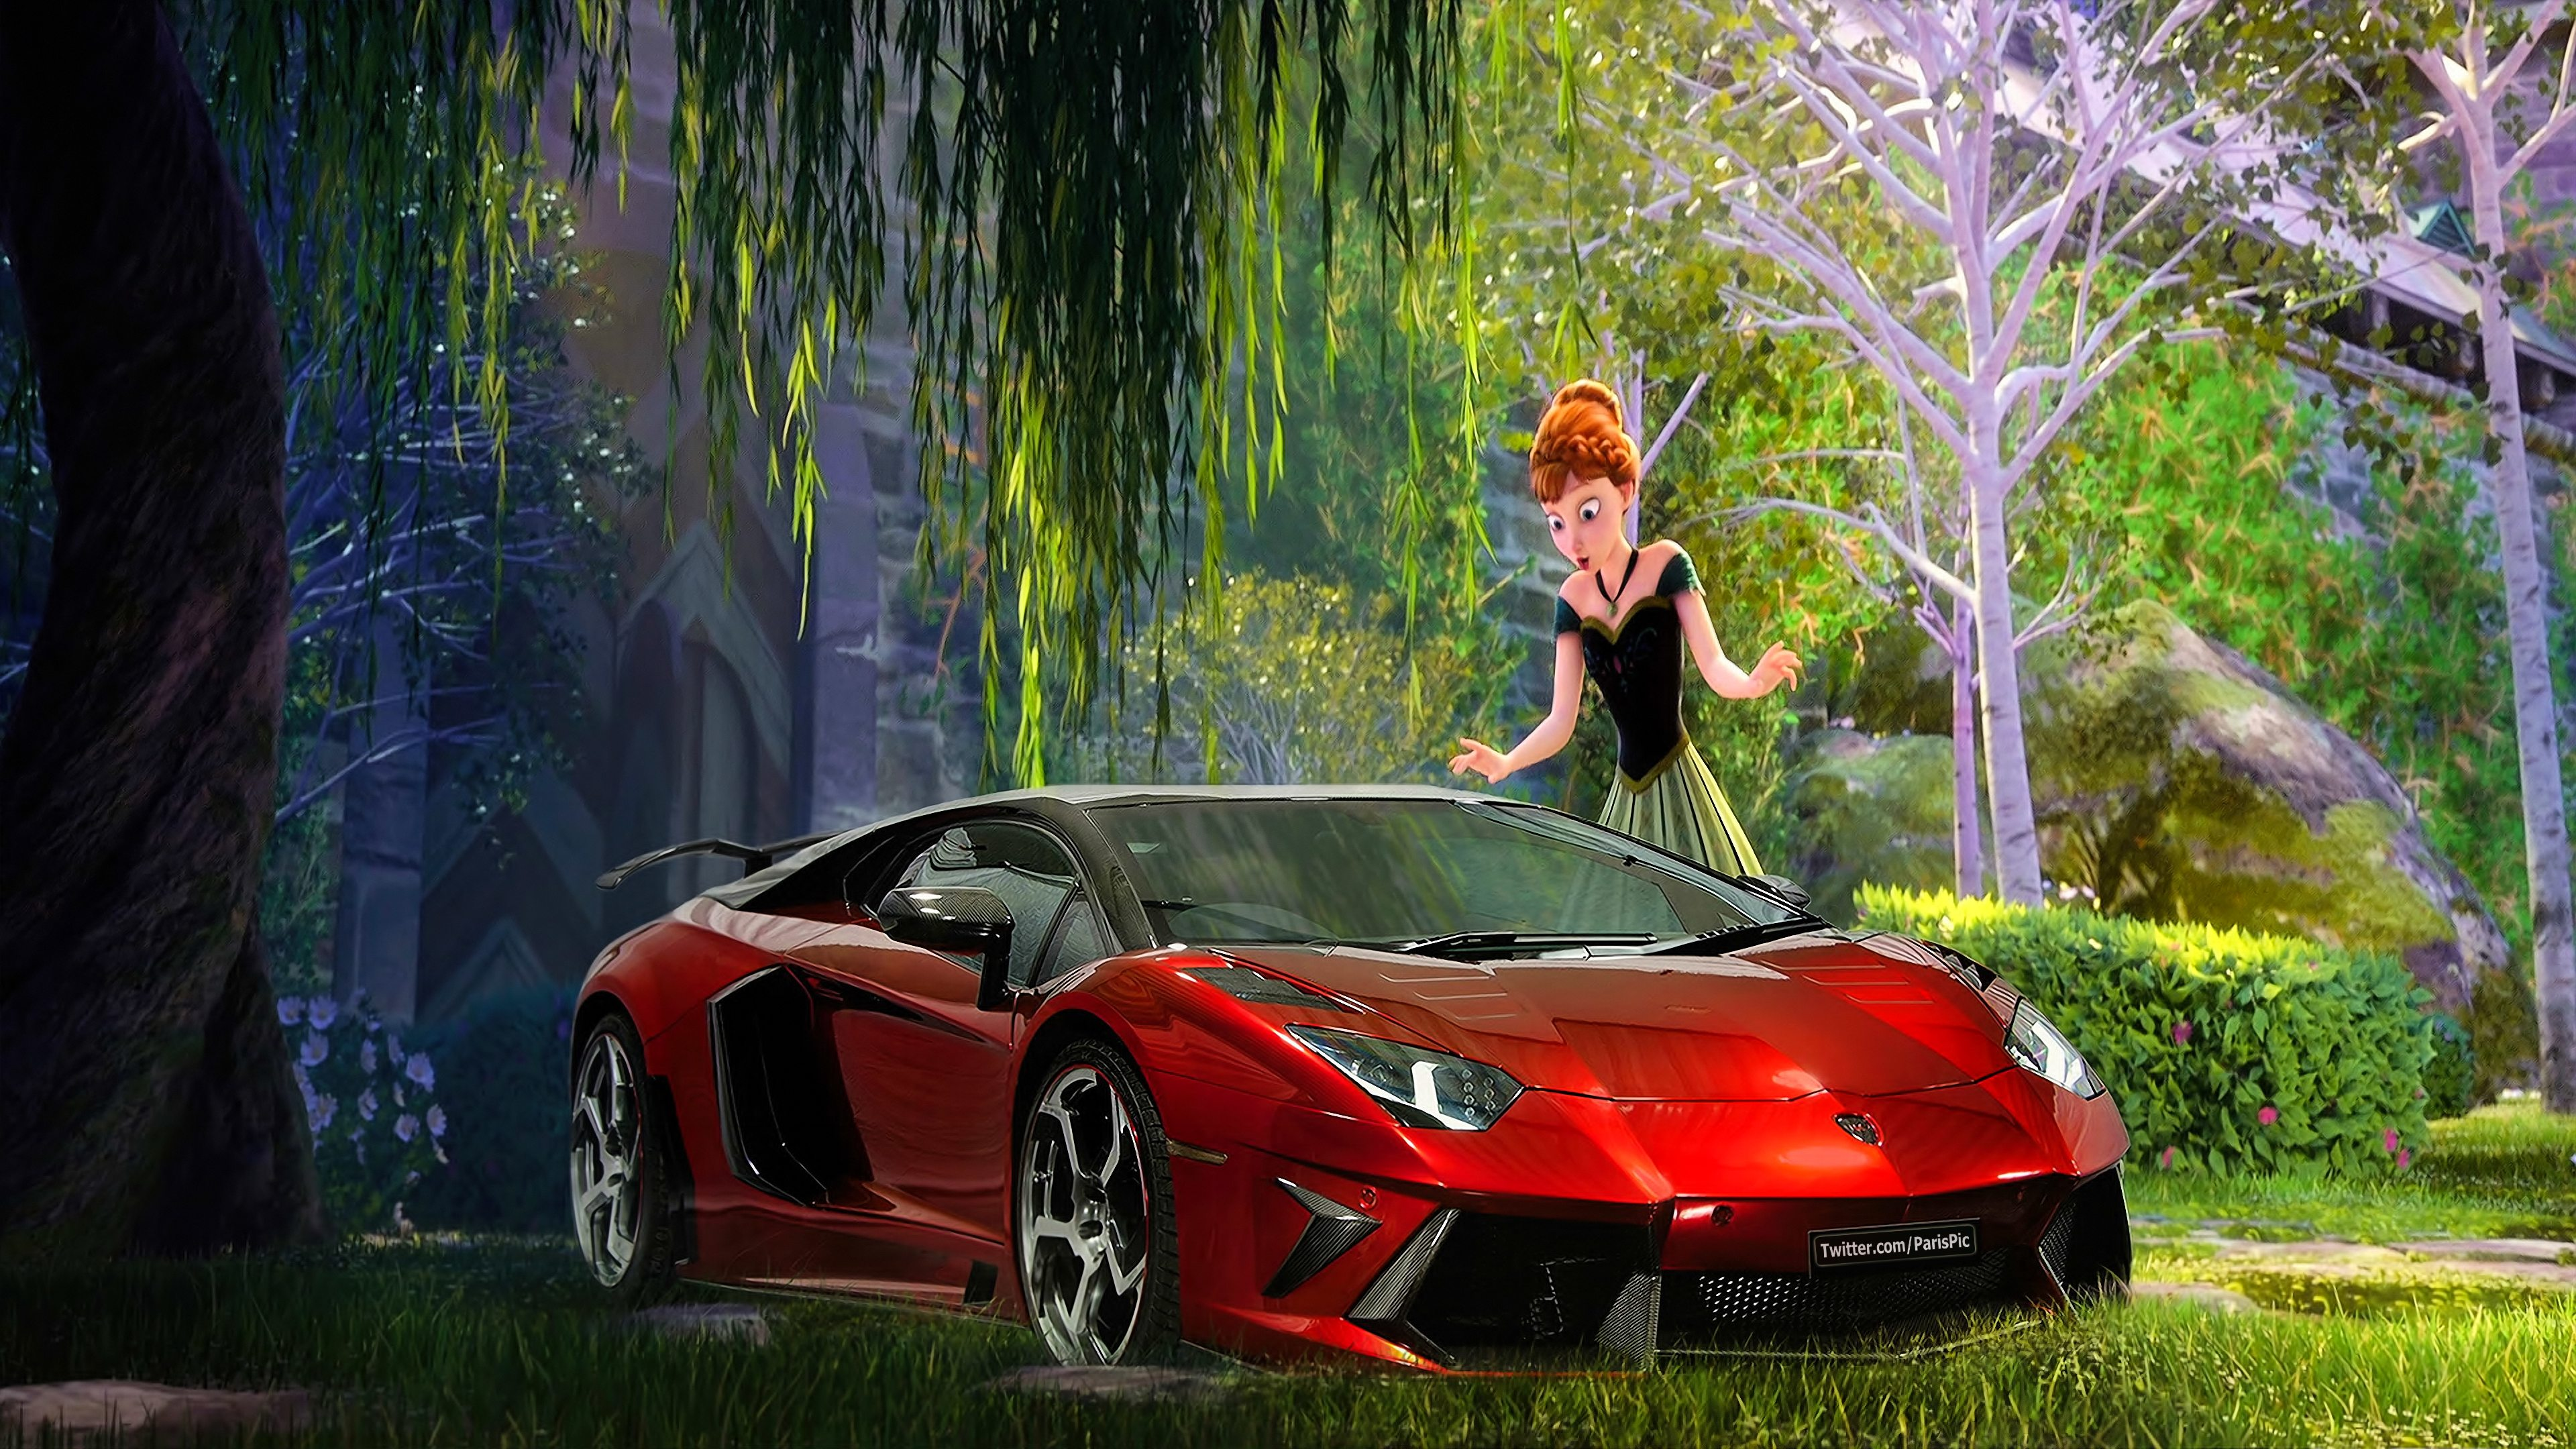 Frozen Anna Elsa 2013 Wallpaper Lamborghini 4k Parispic Disney Princess Fan Art 38791232